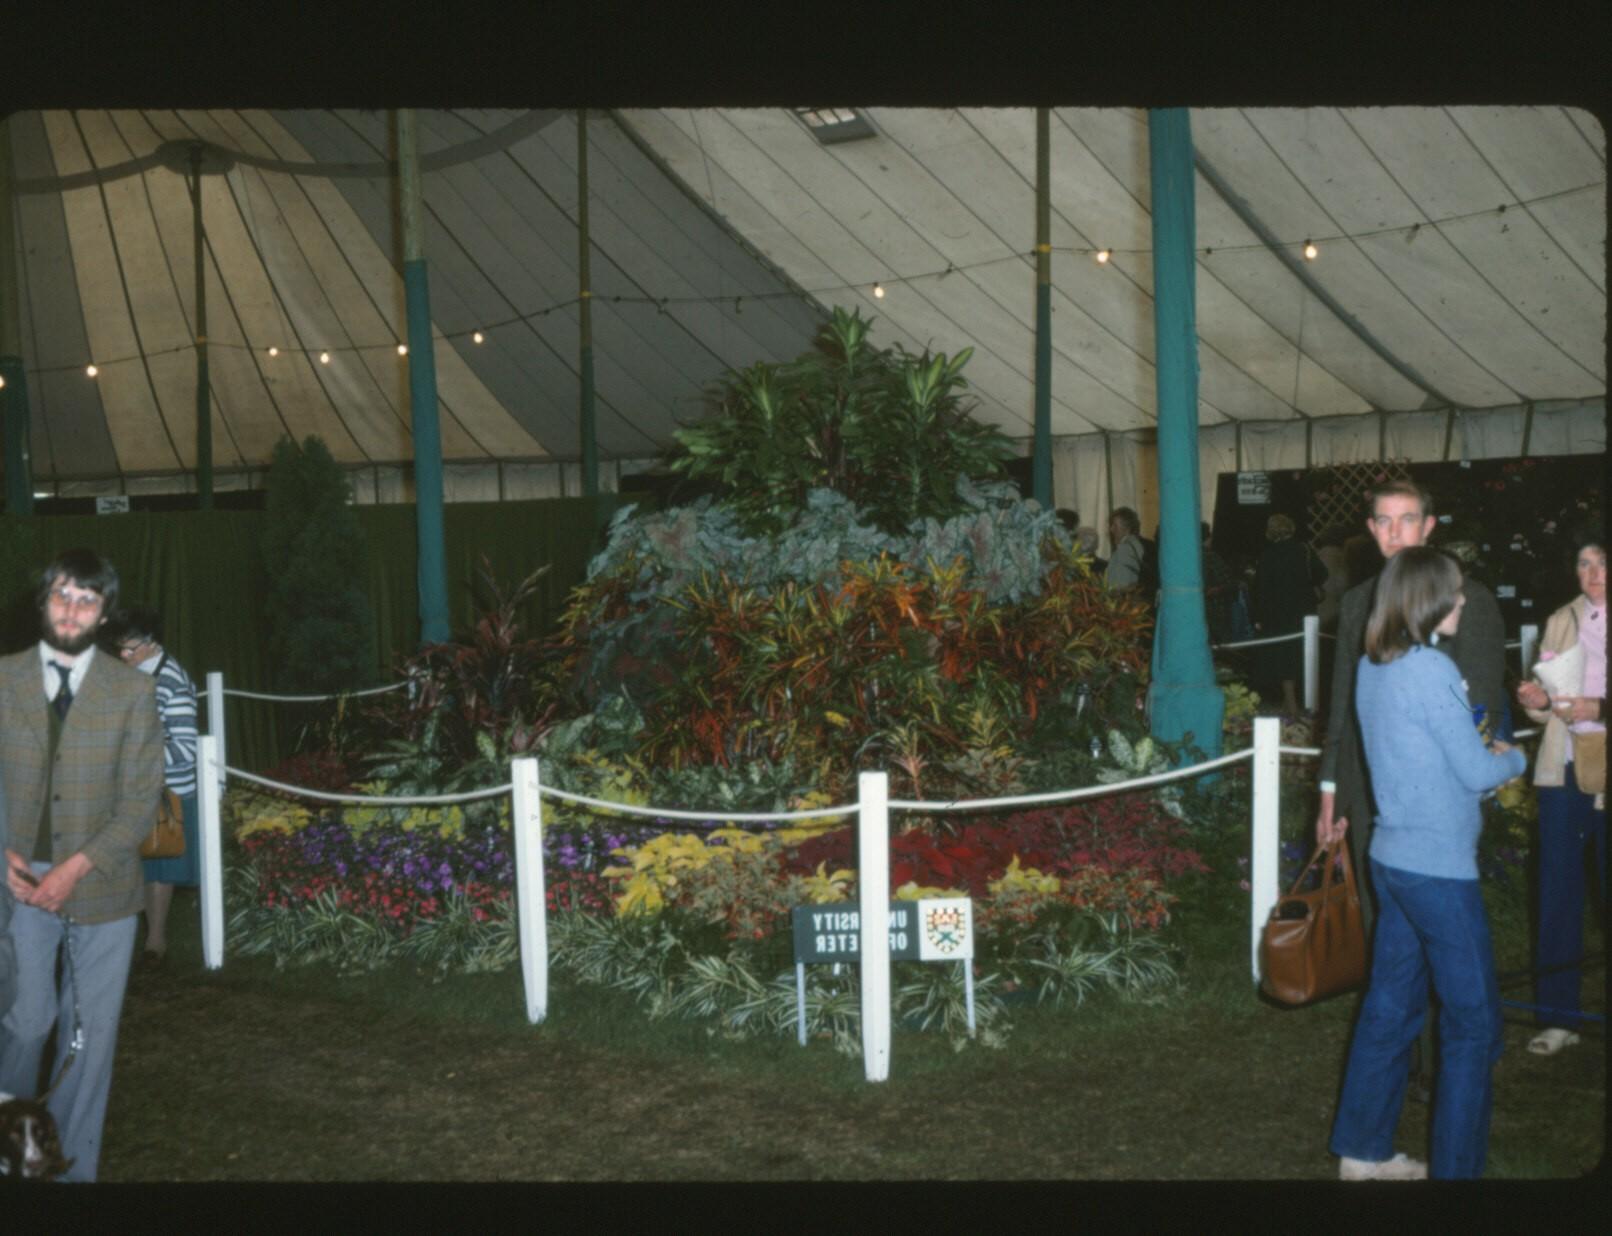 Devon county show (2)